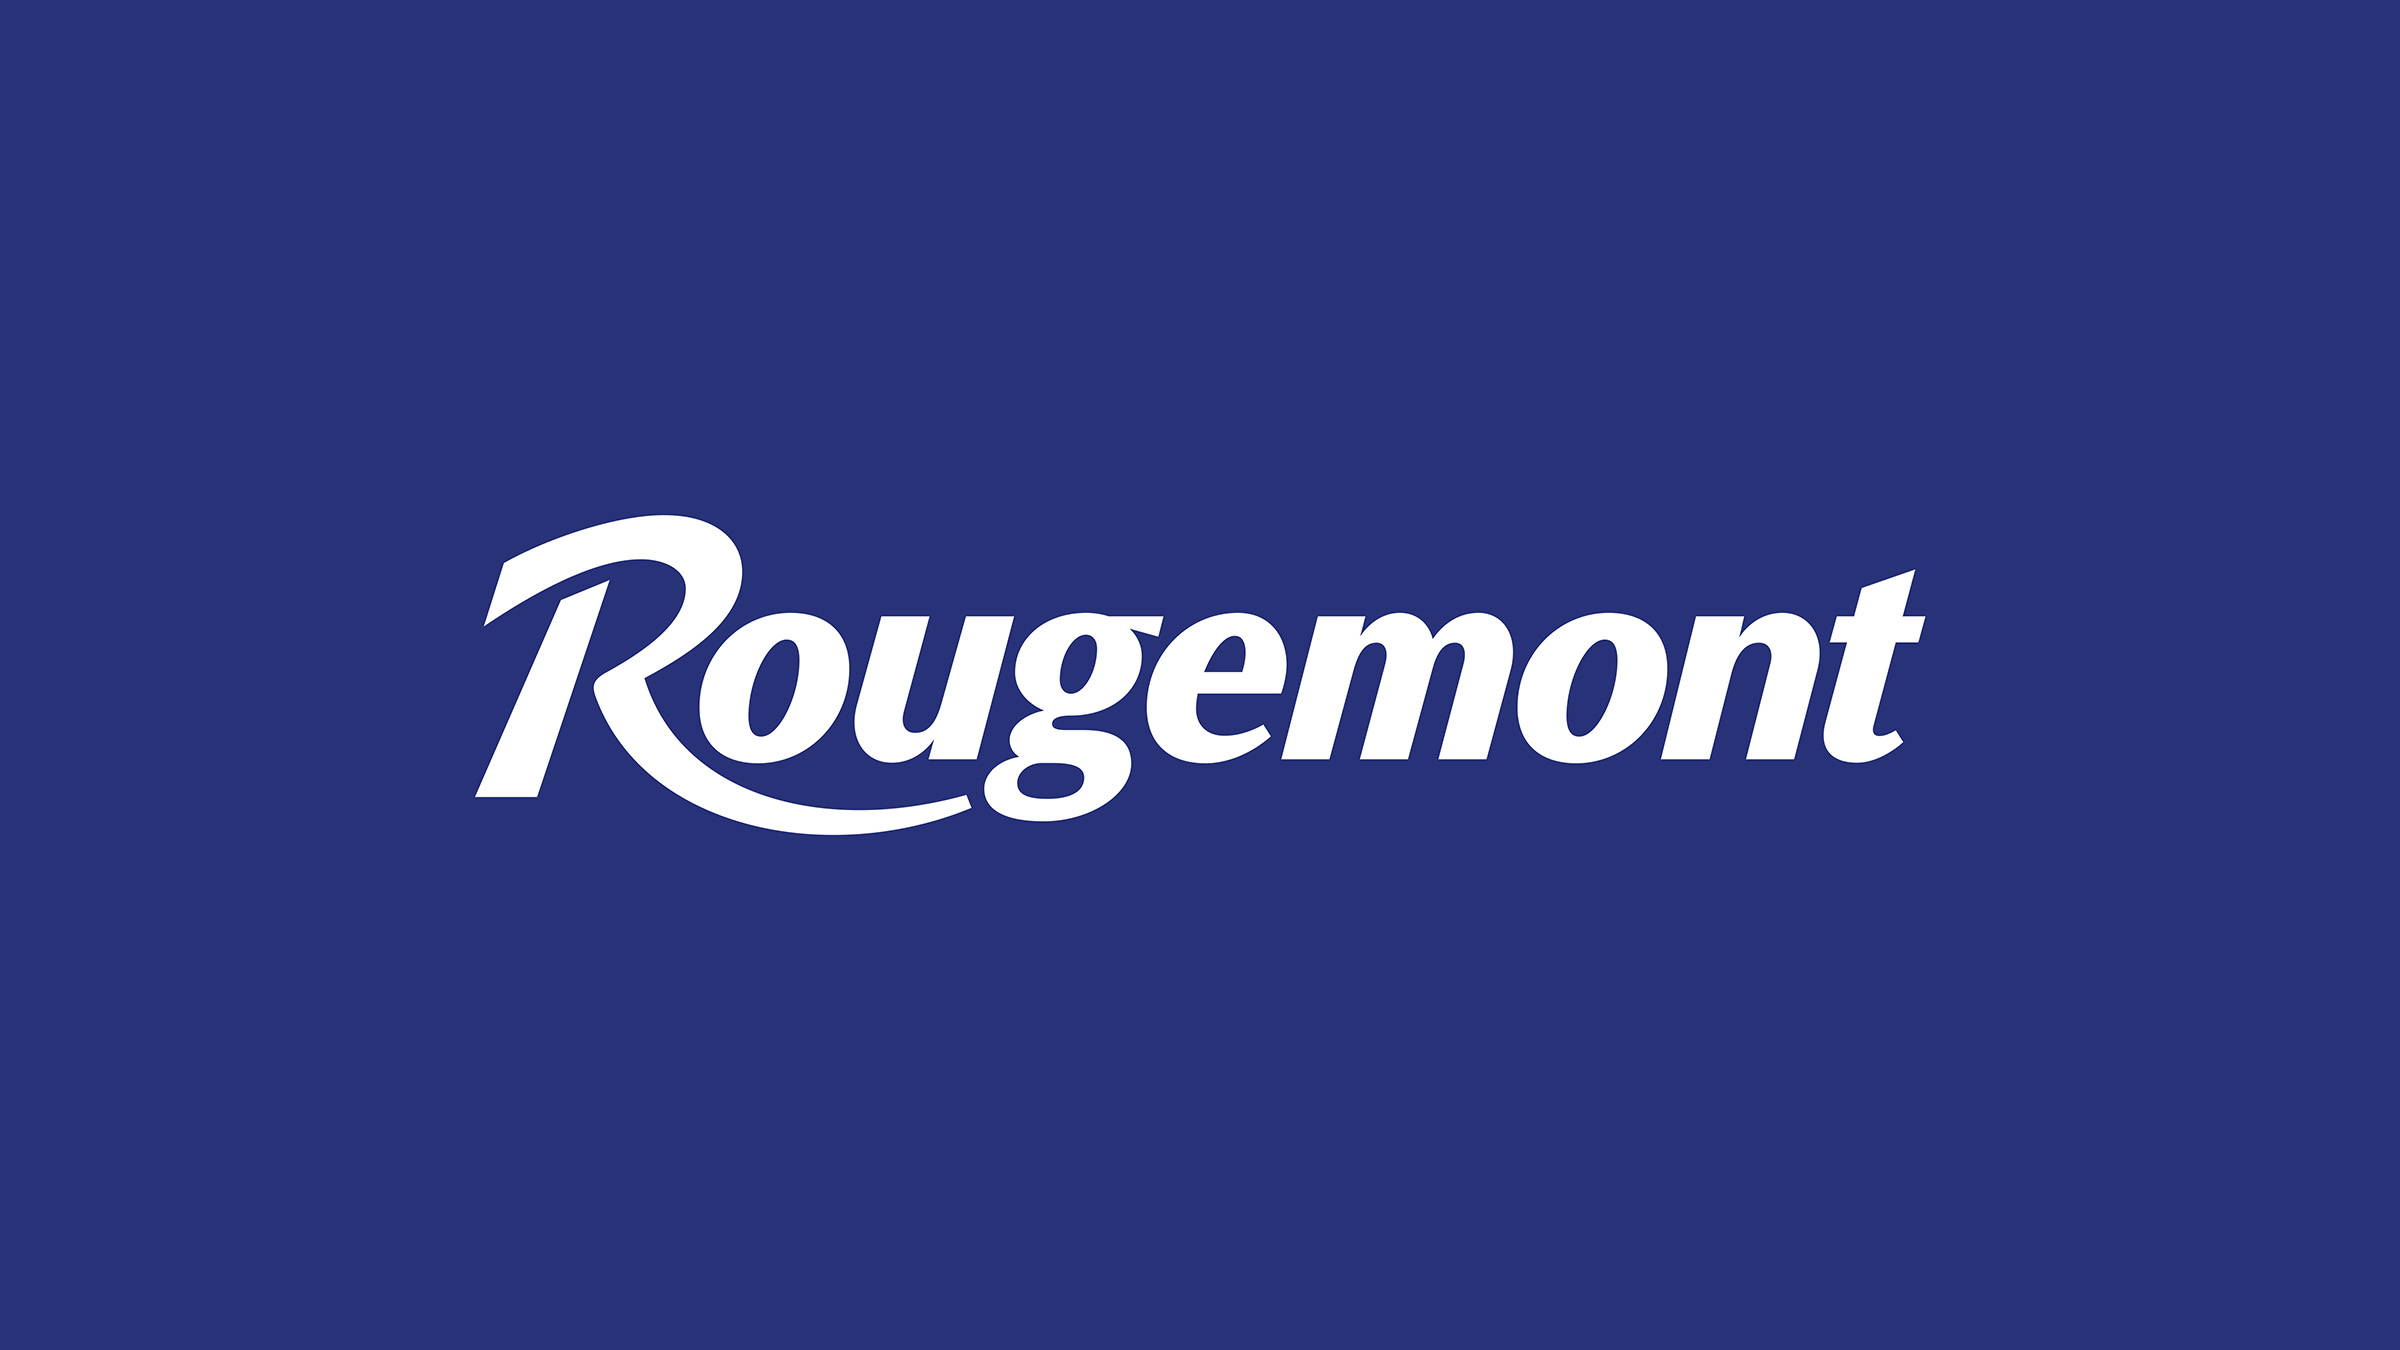 rougemont 1